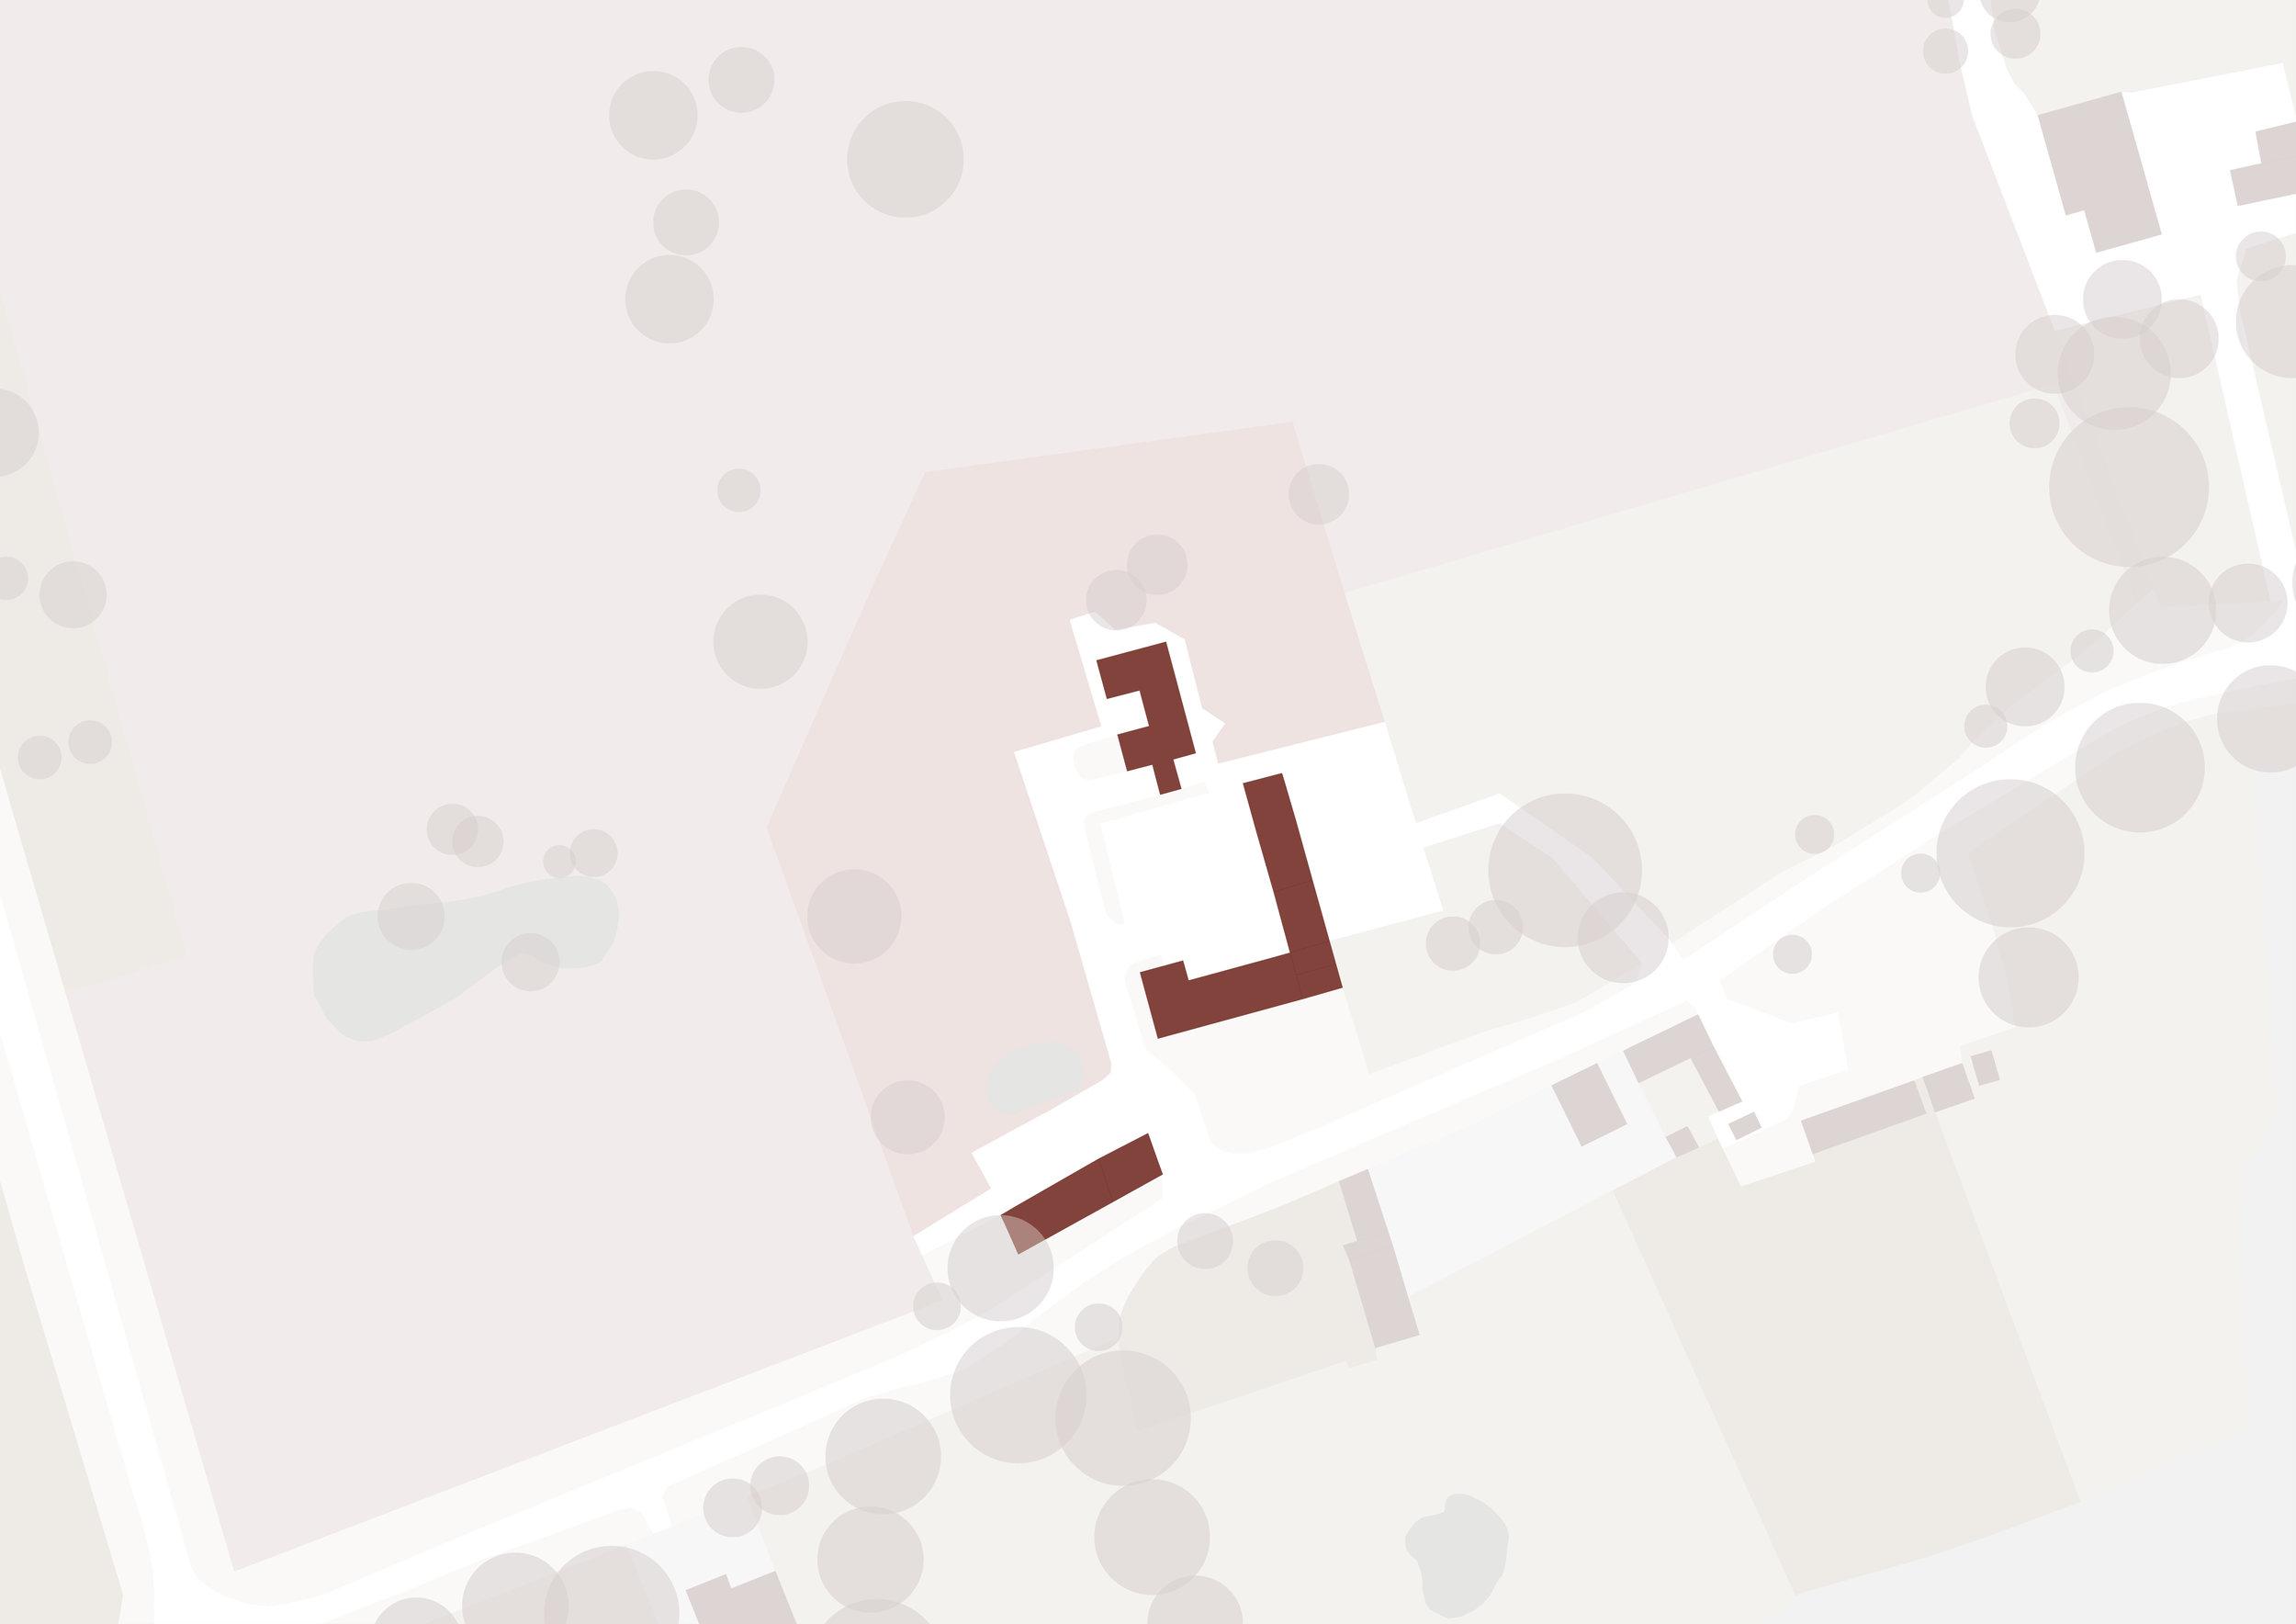 North End Farm Map - East Yorkshire Architects - Samuel Kendall Associates.jpg